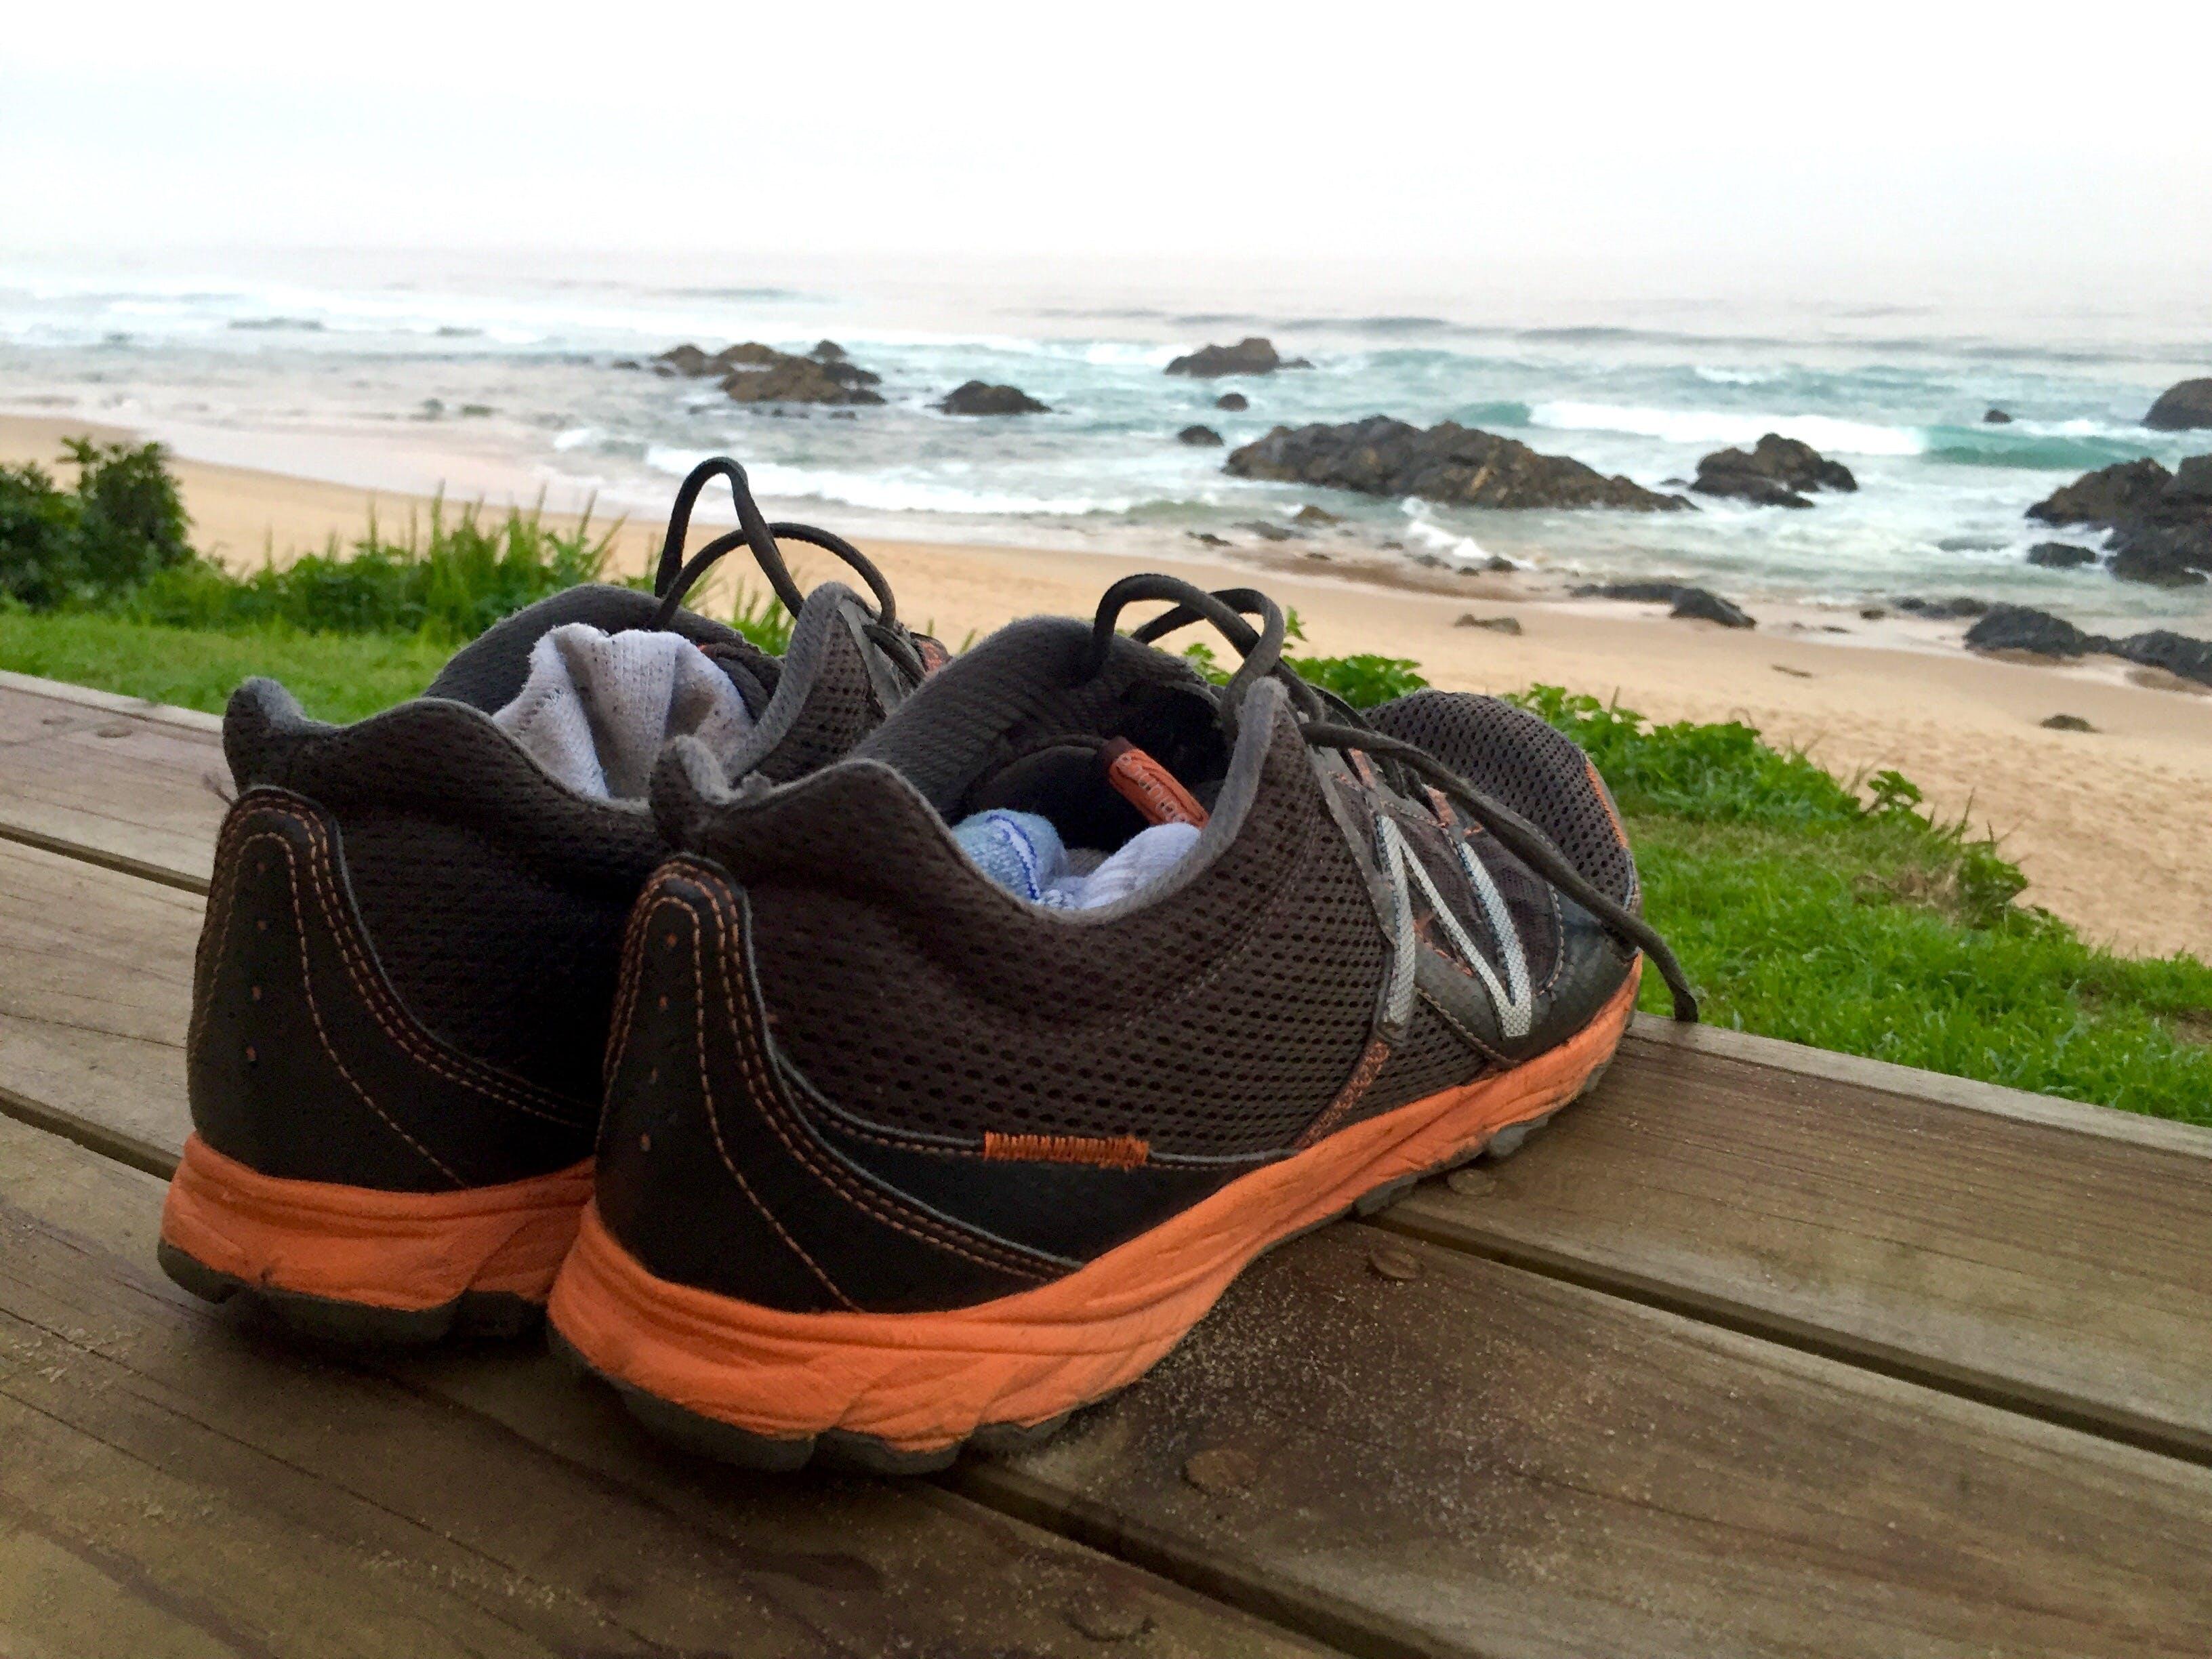 Free stock photo of wood, sea, beach, vacation